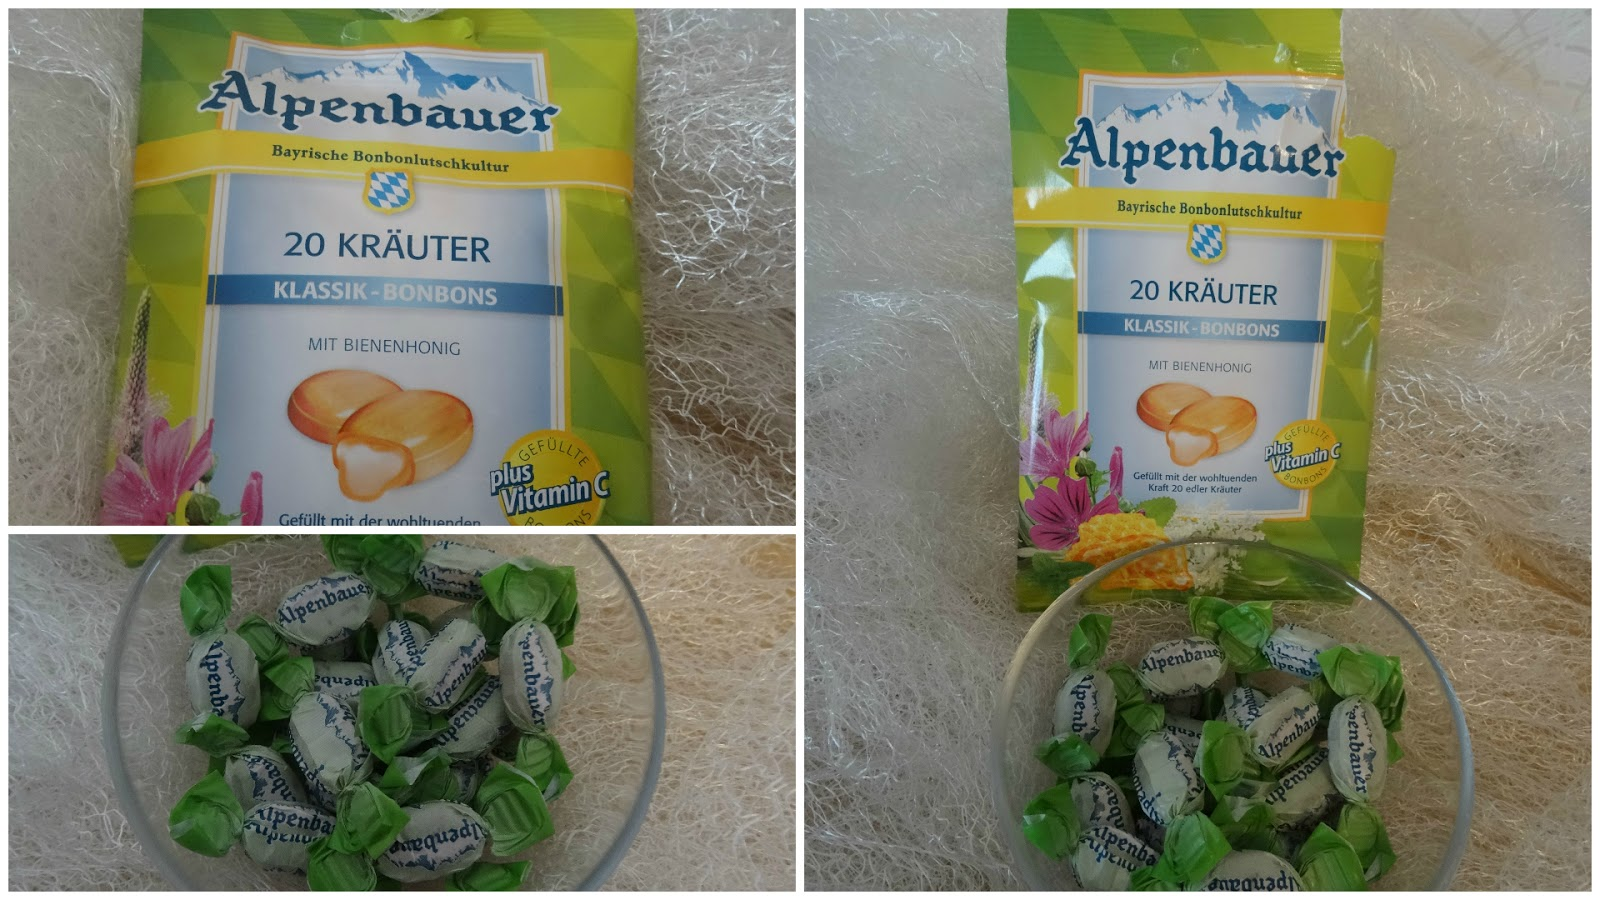 alpenbauer bonbons kaufland